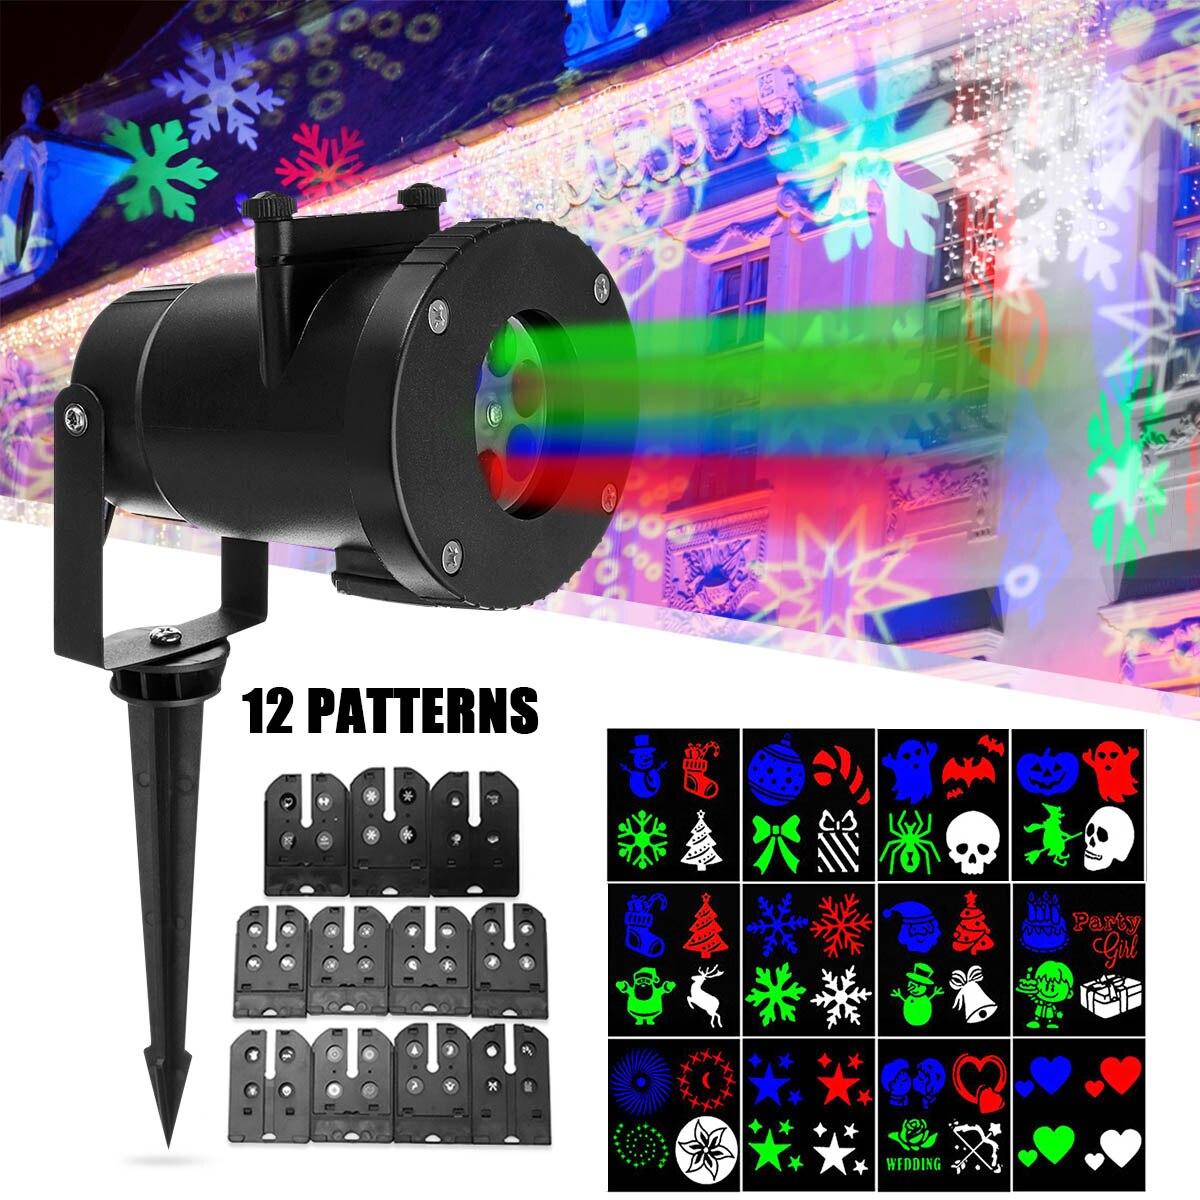 110 240V EU/UK/US Plug Christmas Film Projector Lamp Upgrade With White Light Beads Holiday Lighting 275*135mm